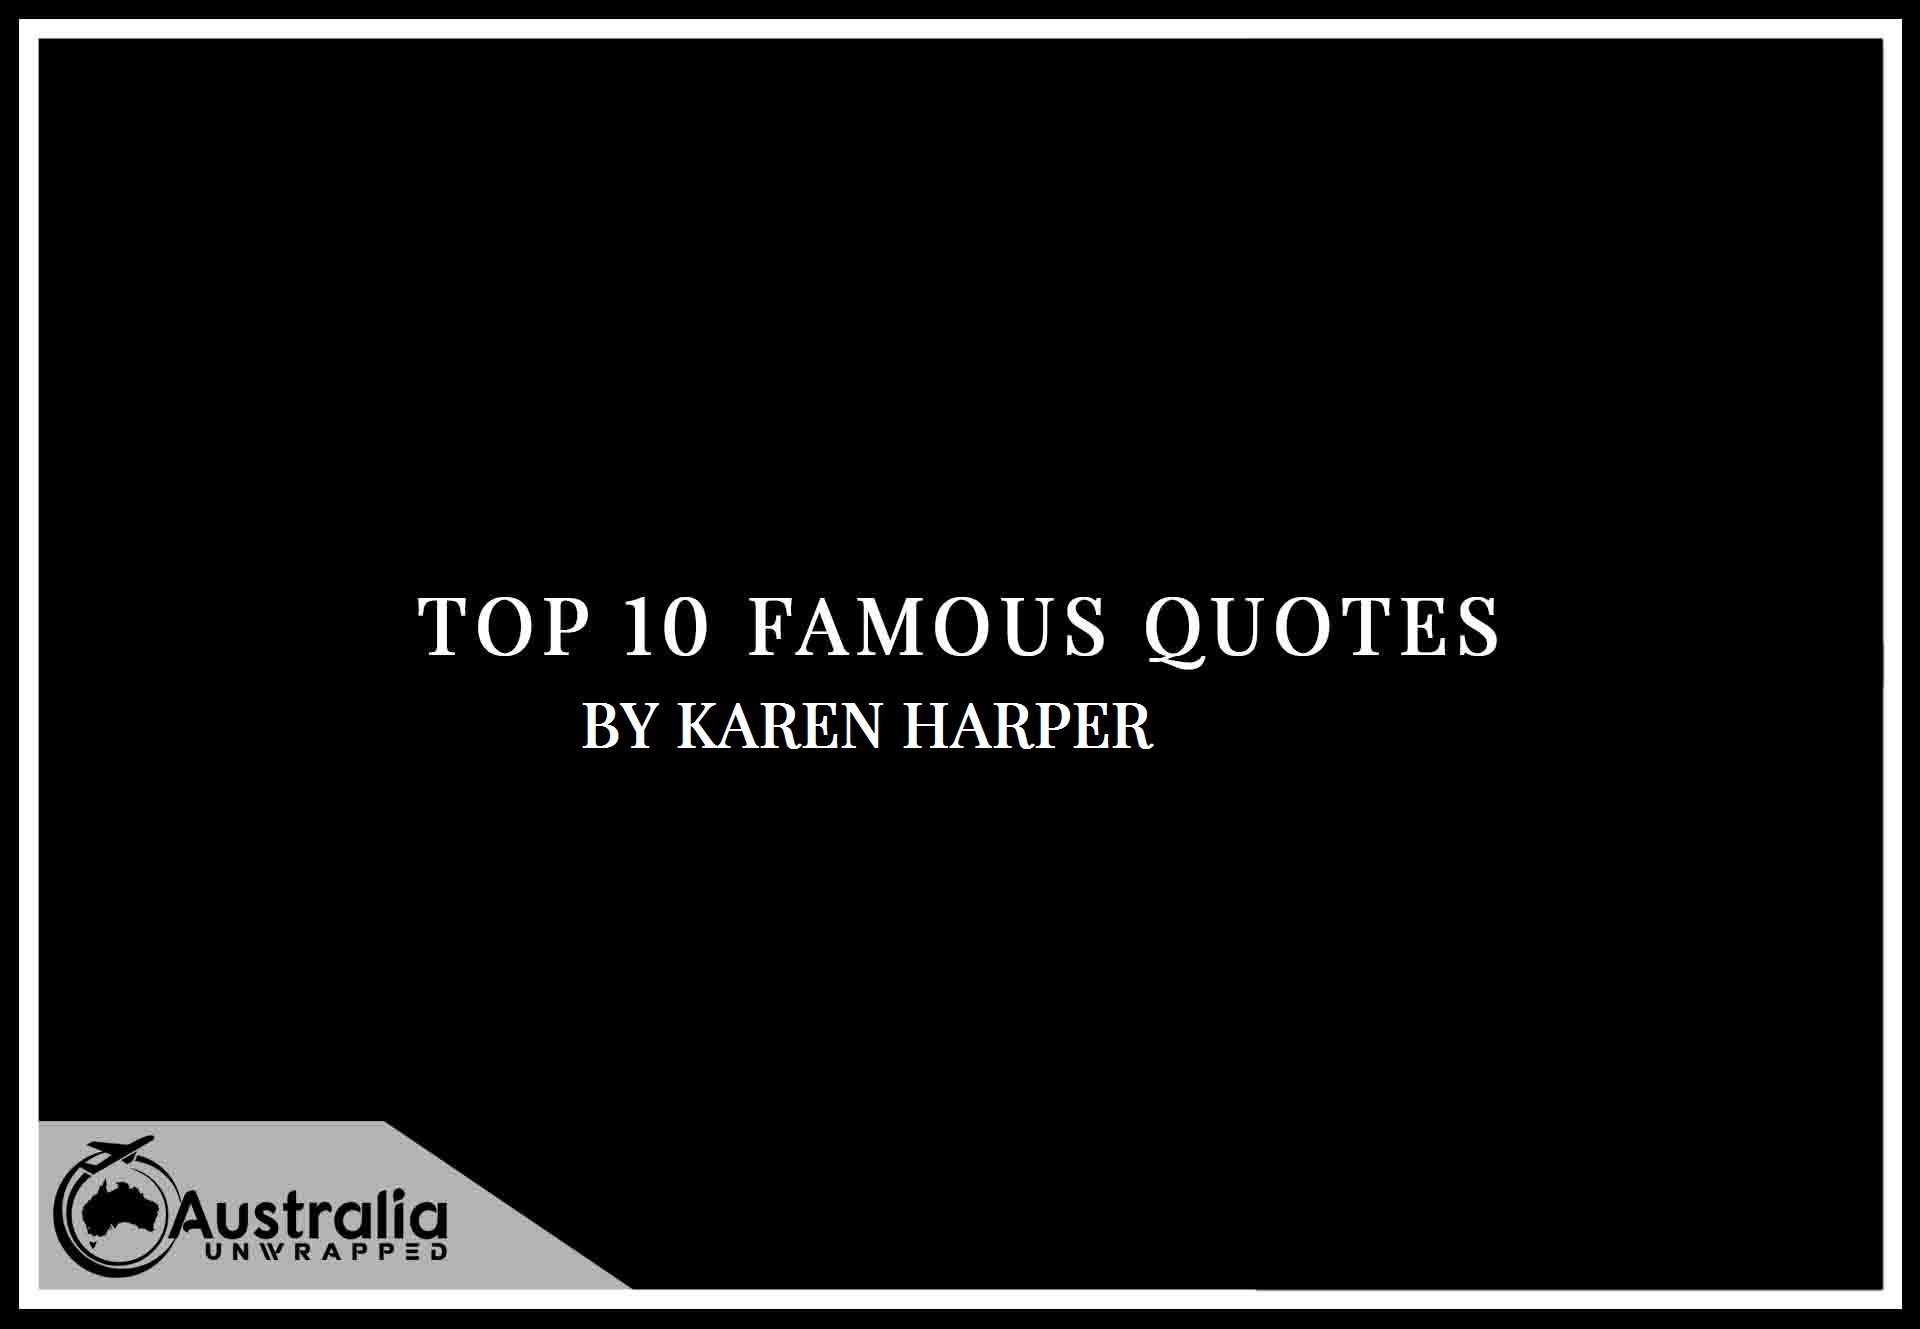 Karen Harper's Top 10 Popular and Famous Quotes